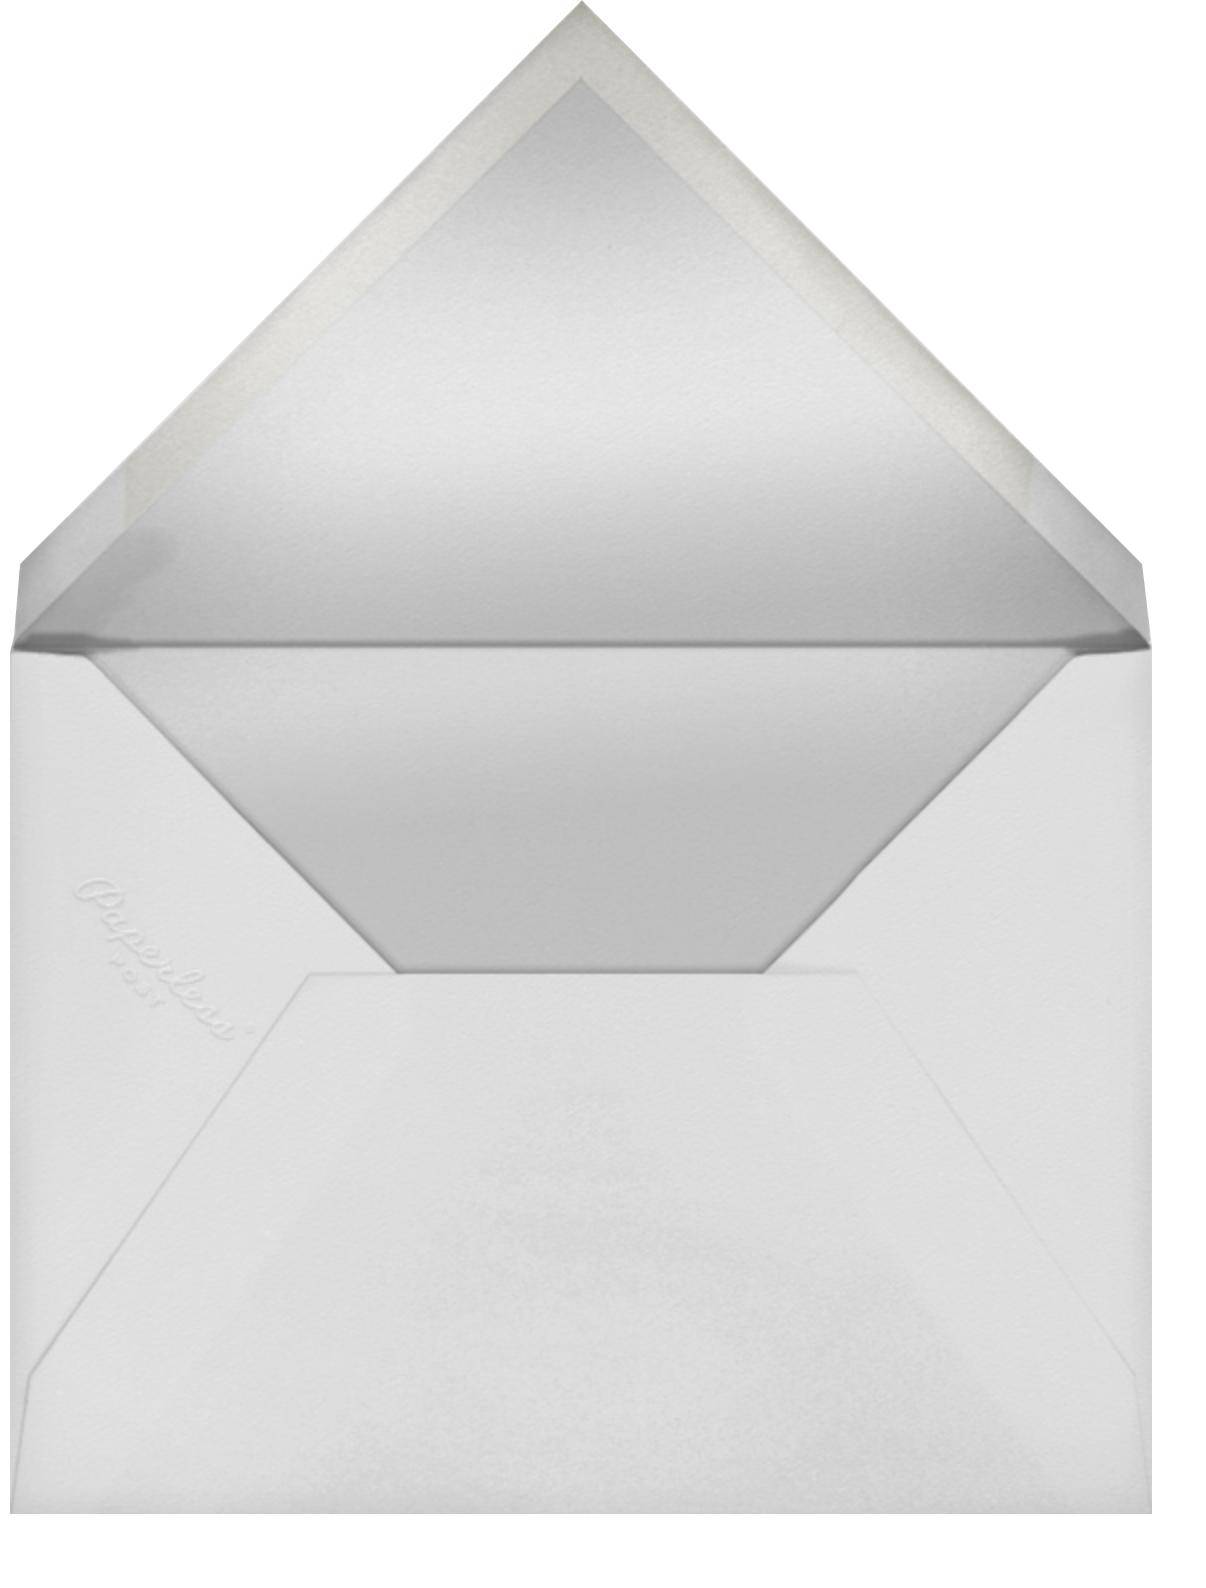 Piedmont (Menu) - Paperless Post - Envelope